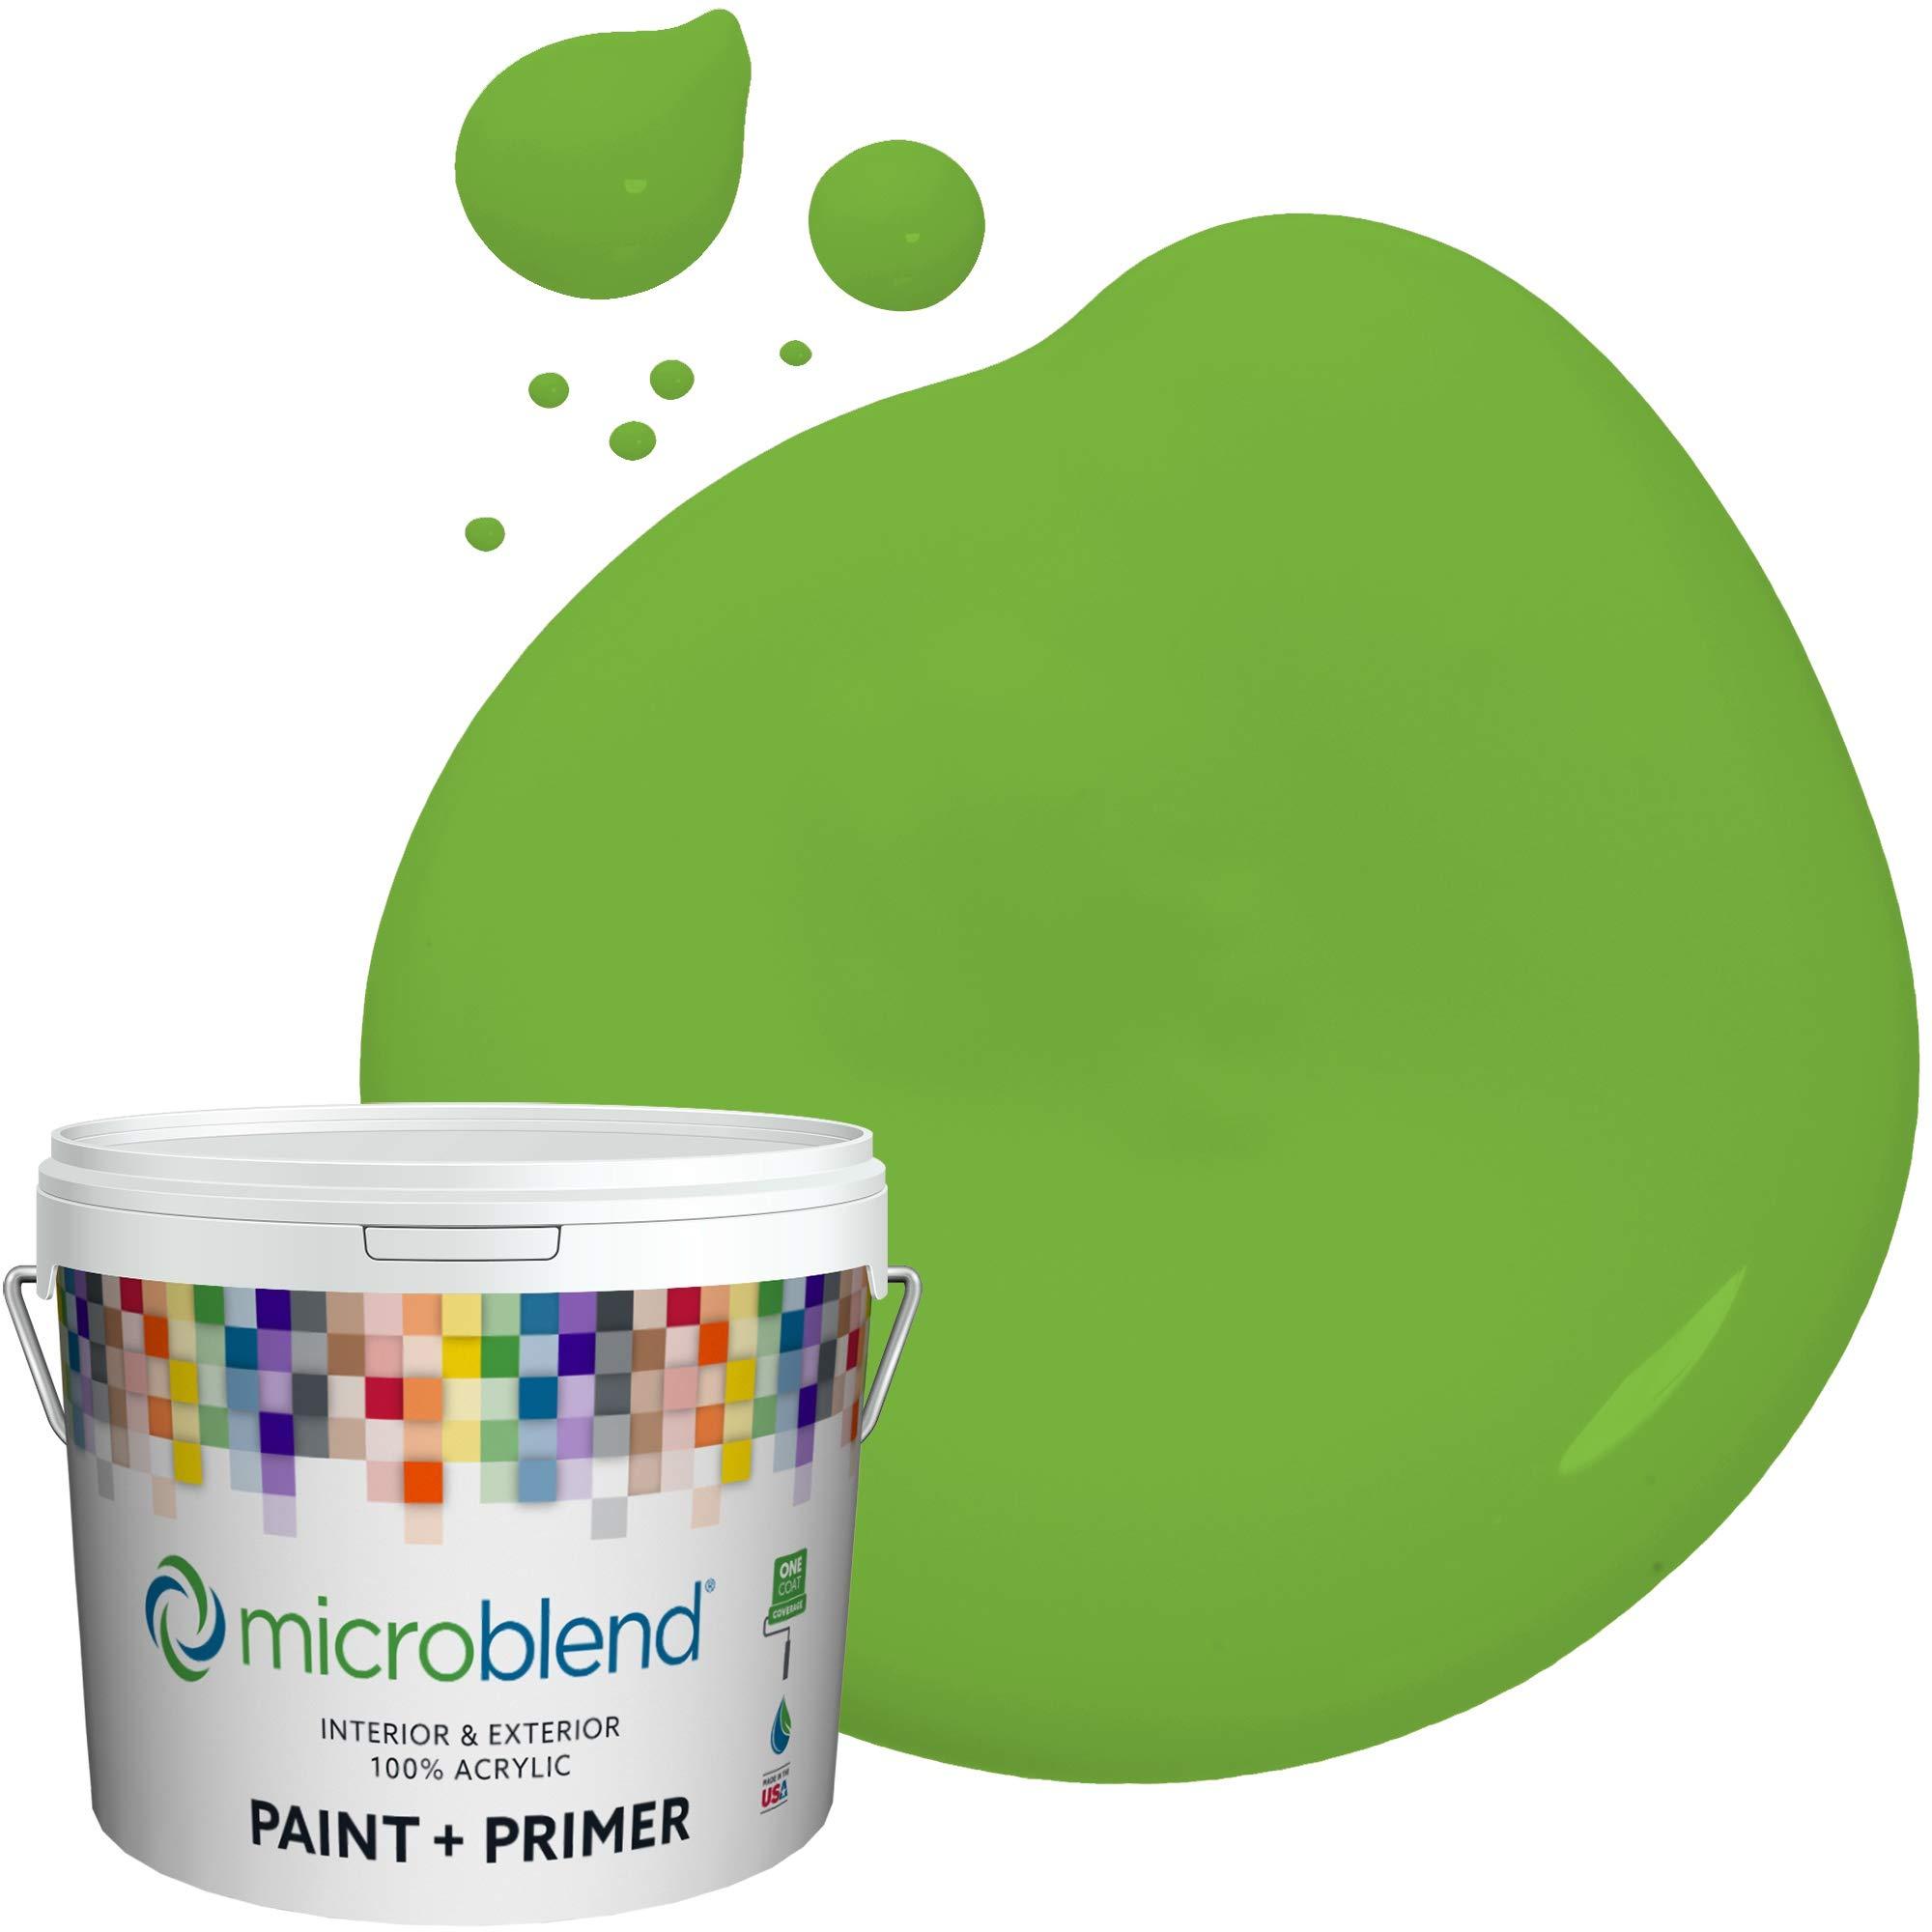 MicroBlend Interior Paint + Primer, Fresh Cut Grass, Semi-Gloss Sheen, 1 Gallon, Custom Made, Premium Quality One Coat Hide & Washable Paint